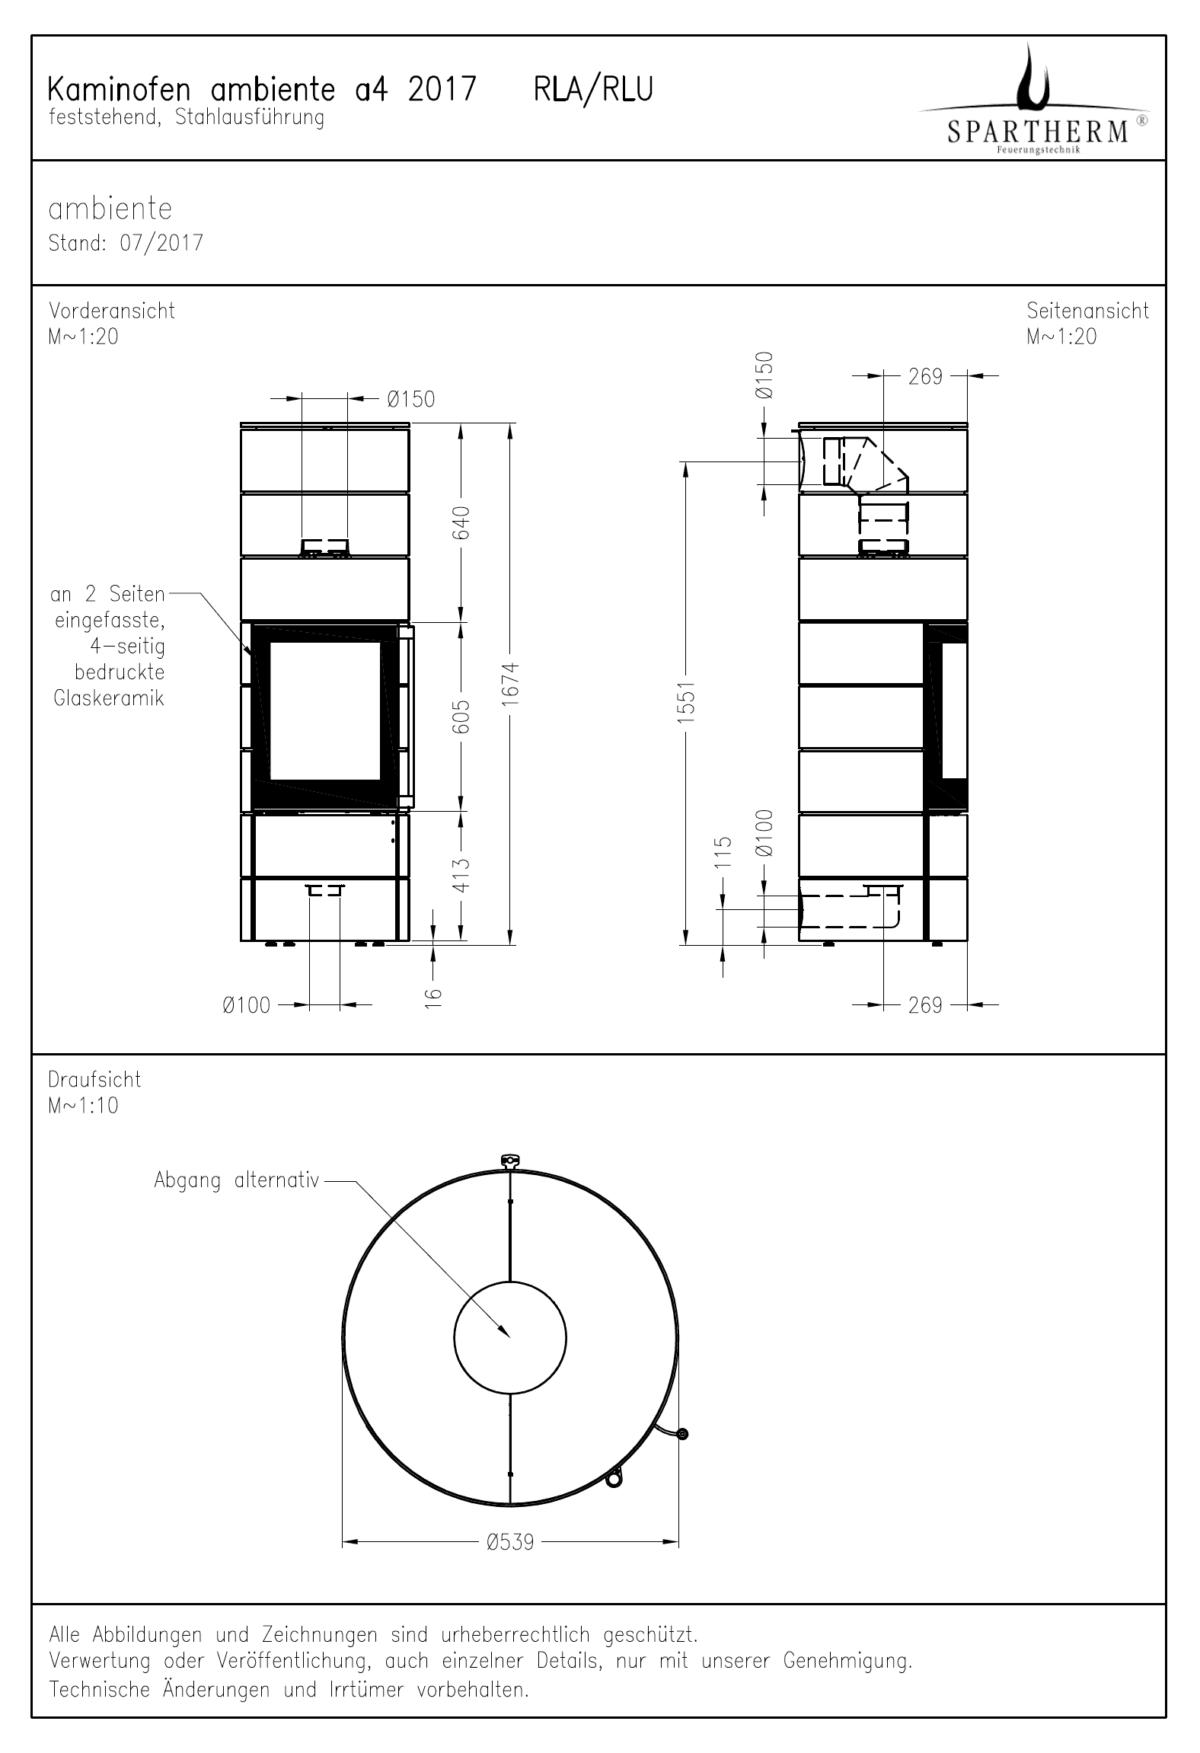 spartherm-ambiente-a4-line_image